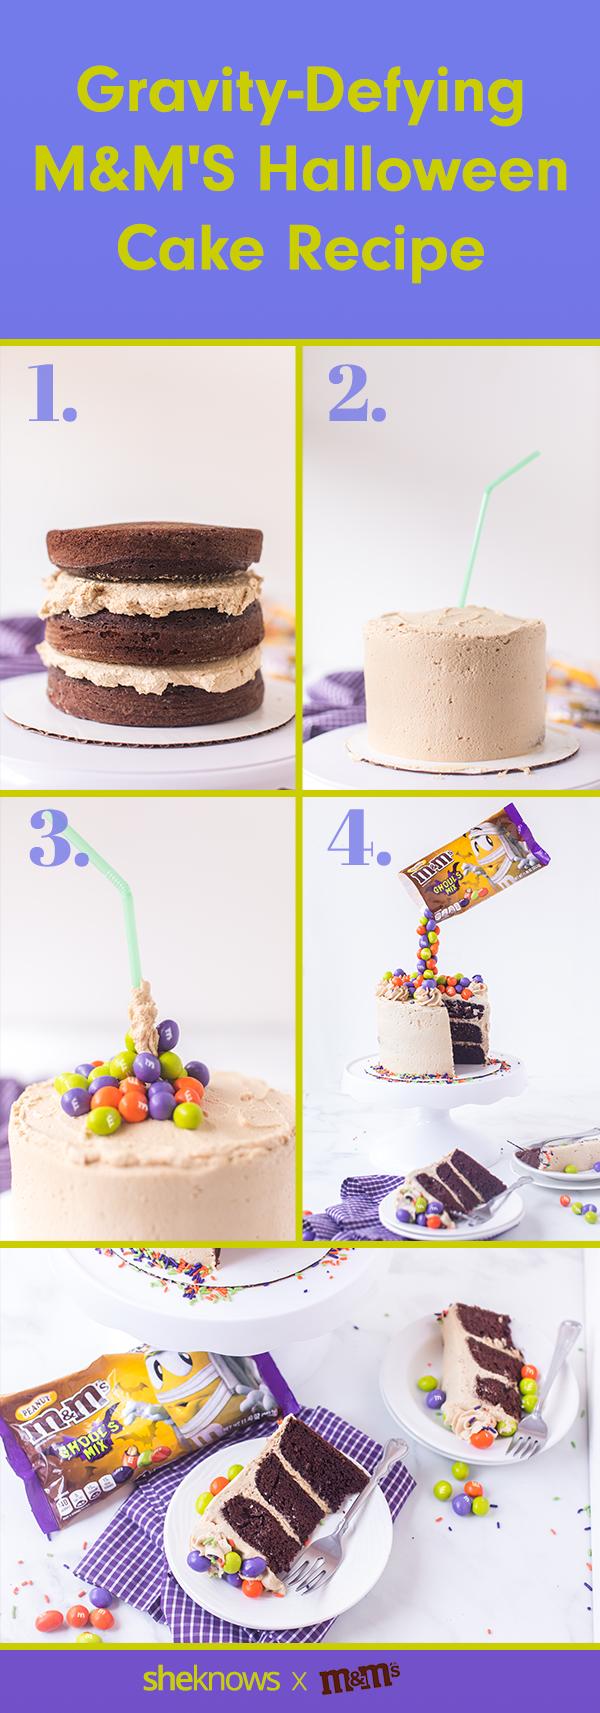 Pleasant Halloween Cake Recipe How To Make A Gravity Defying Mms Cake Funny Birthday Cards Online Inifofree Goldxyz